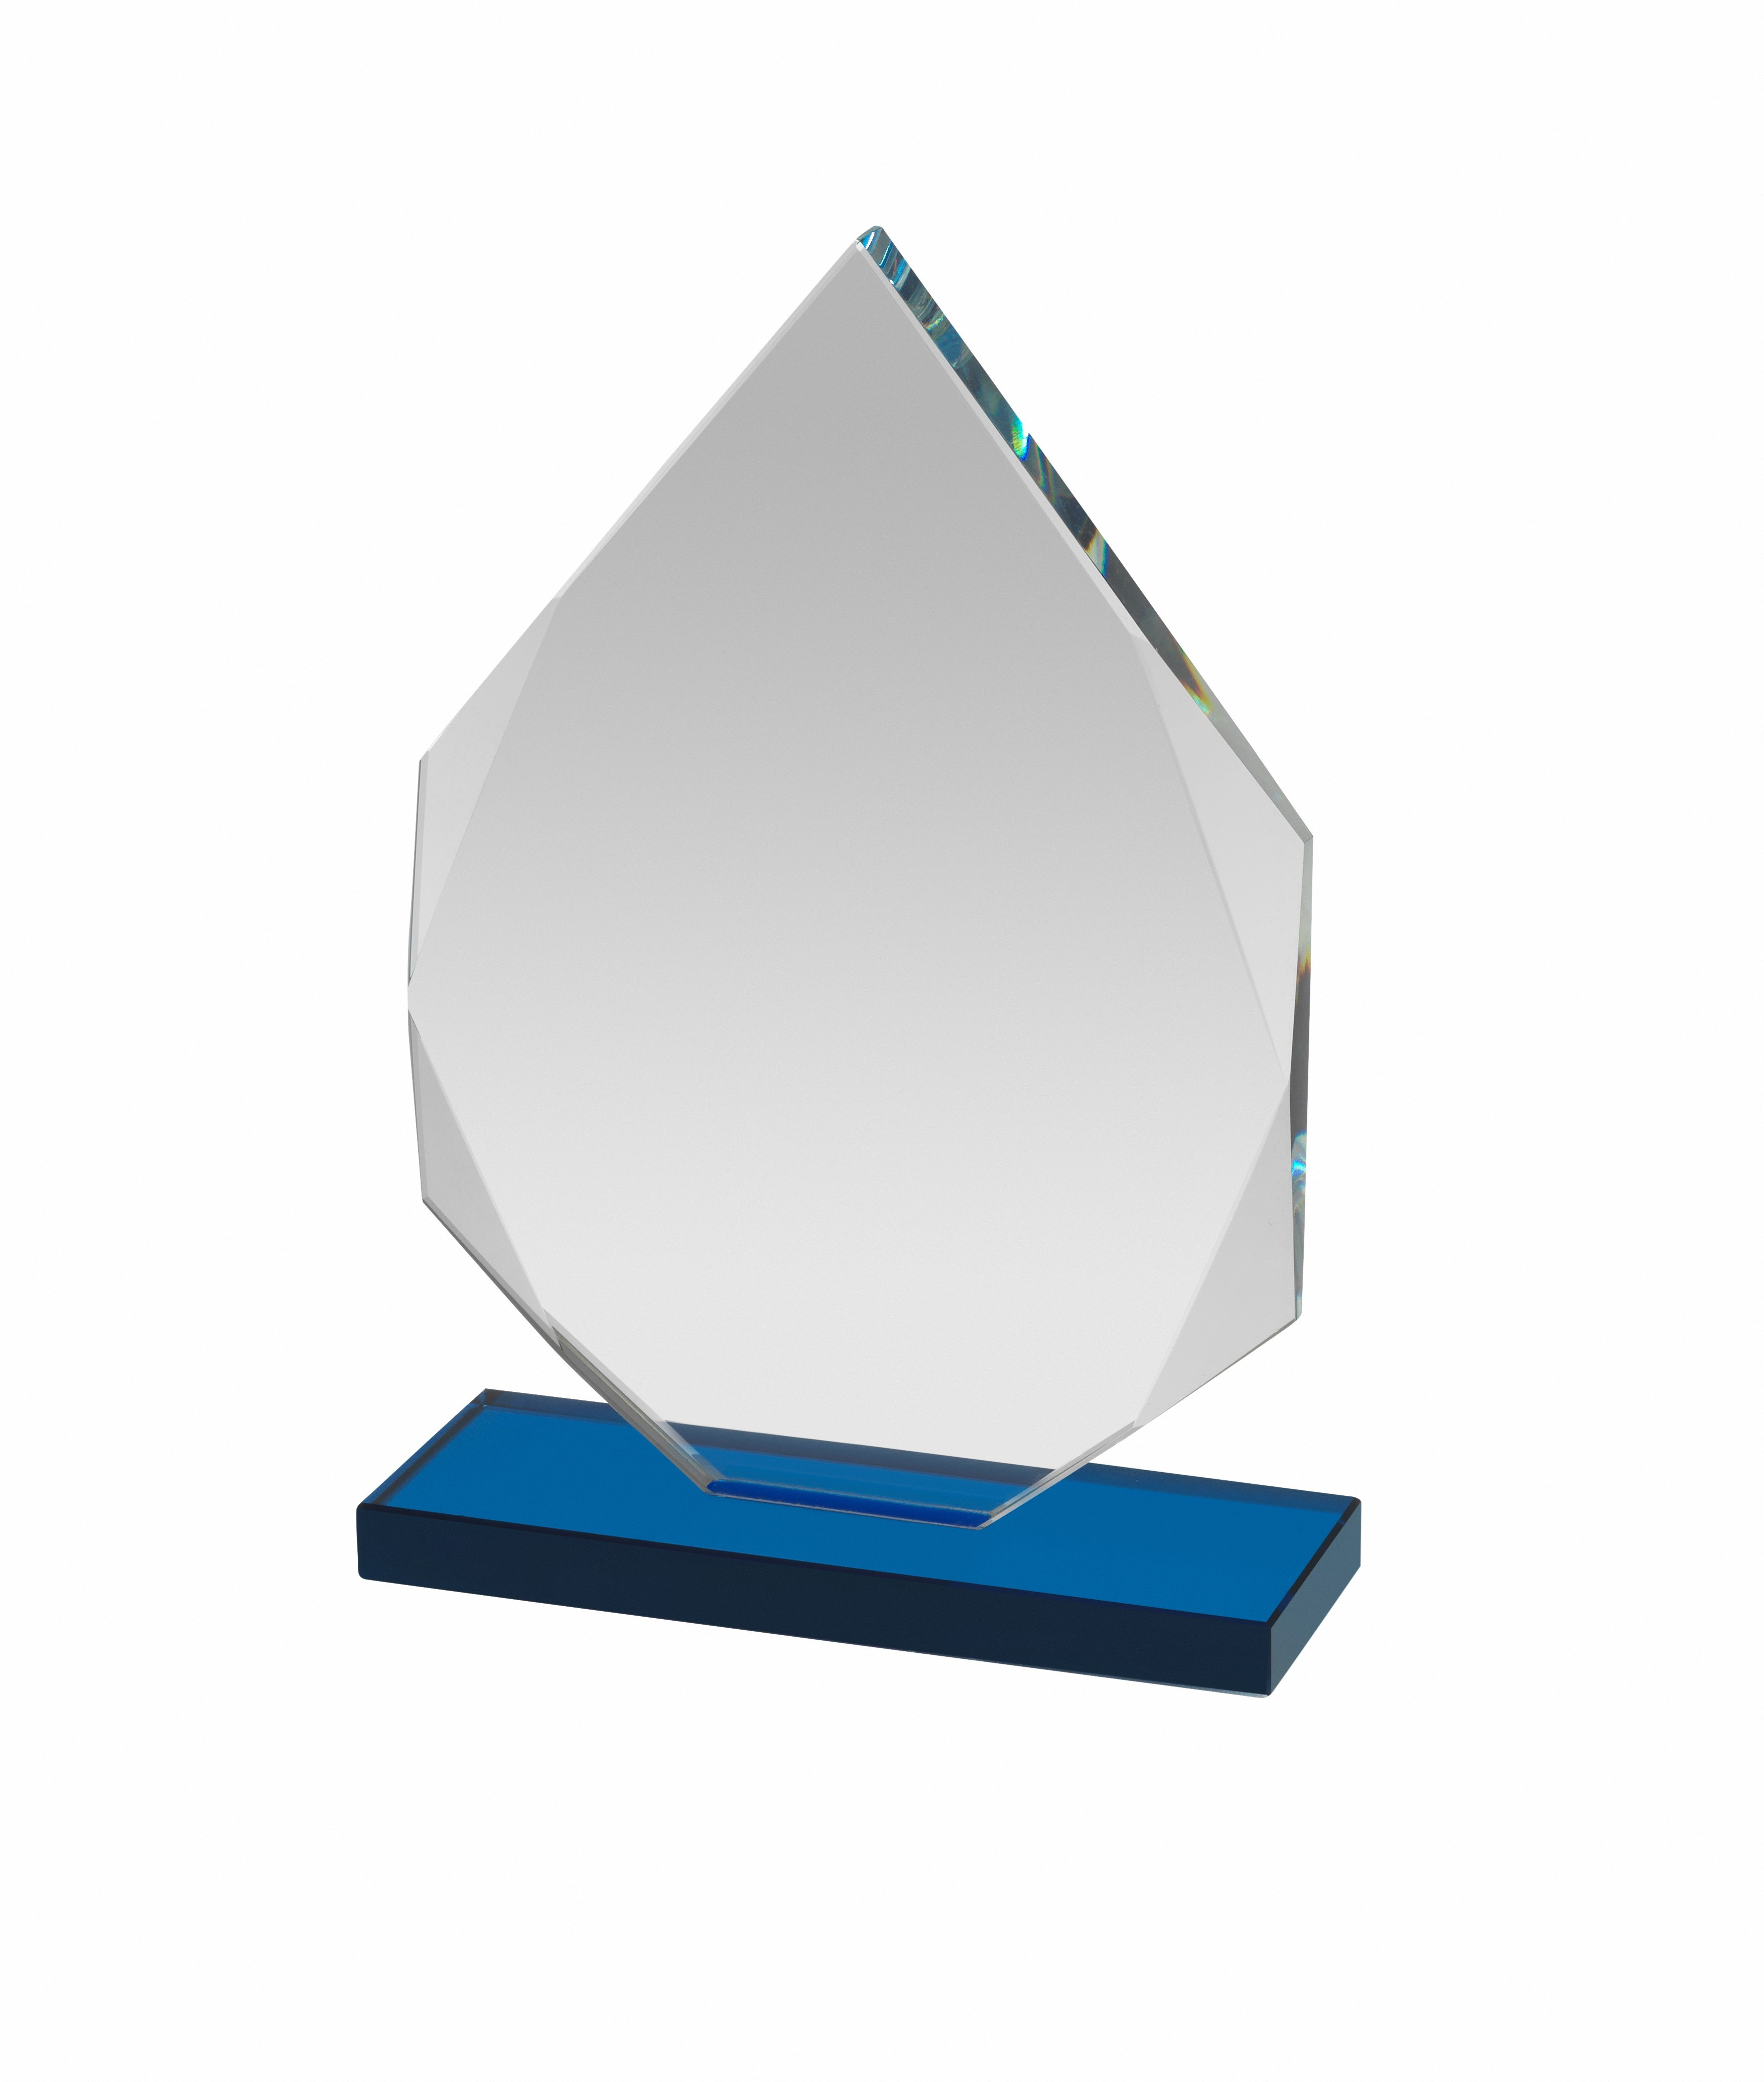 Clear & Blue Glass Diamond Award